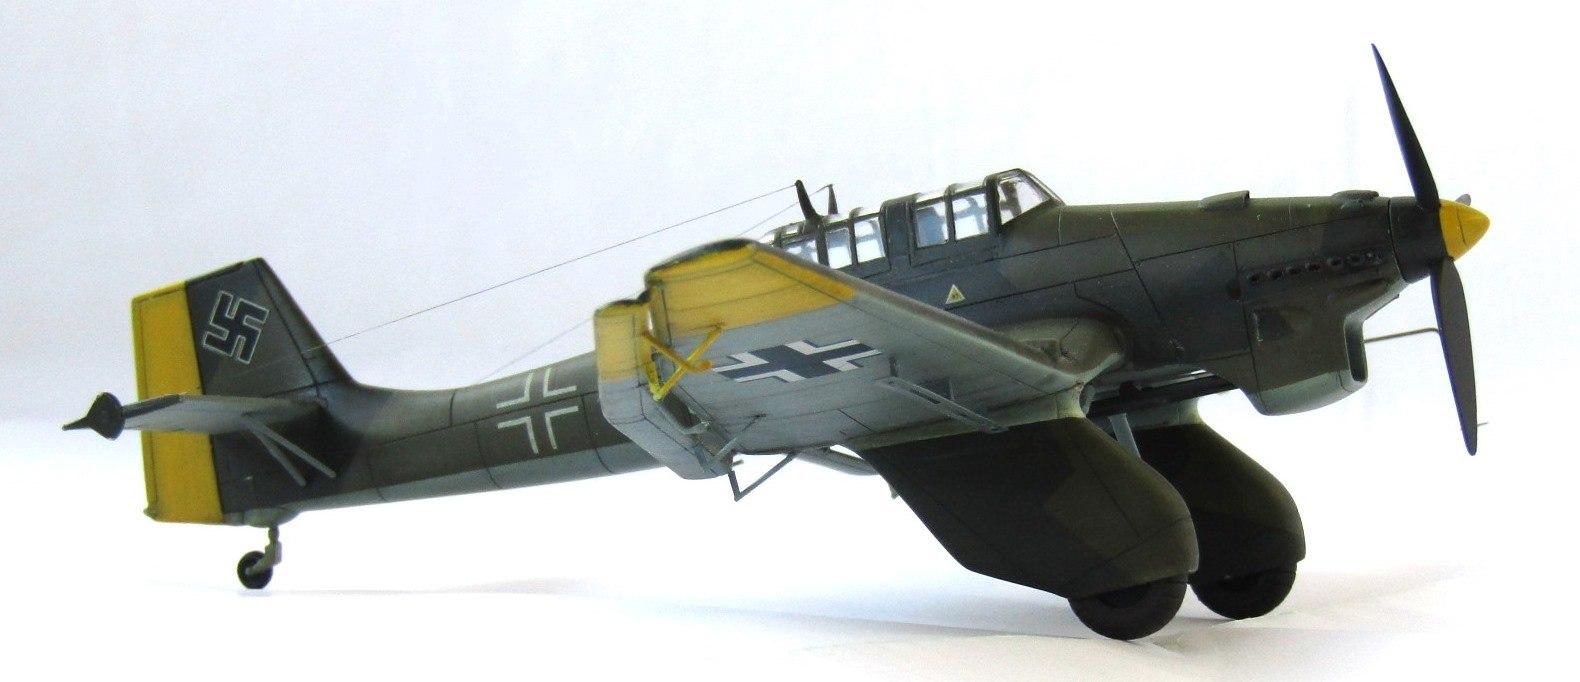 Ju-87A 1/72 (Special Hobby) _aqEwY_cxi0